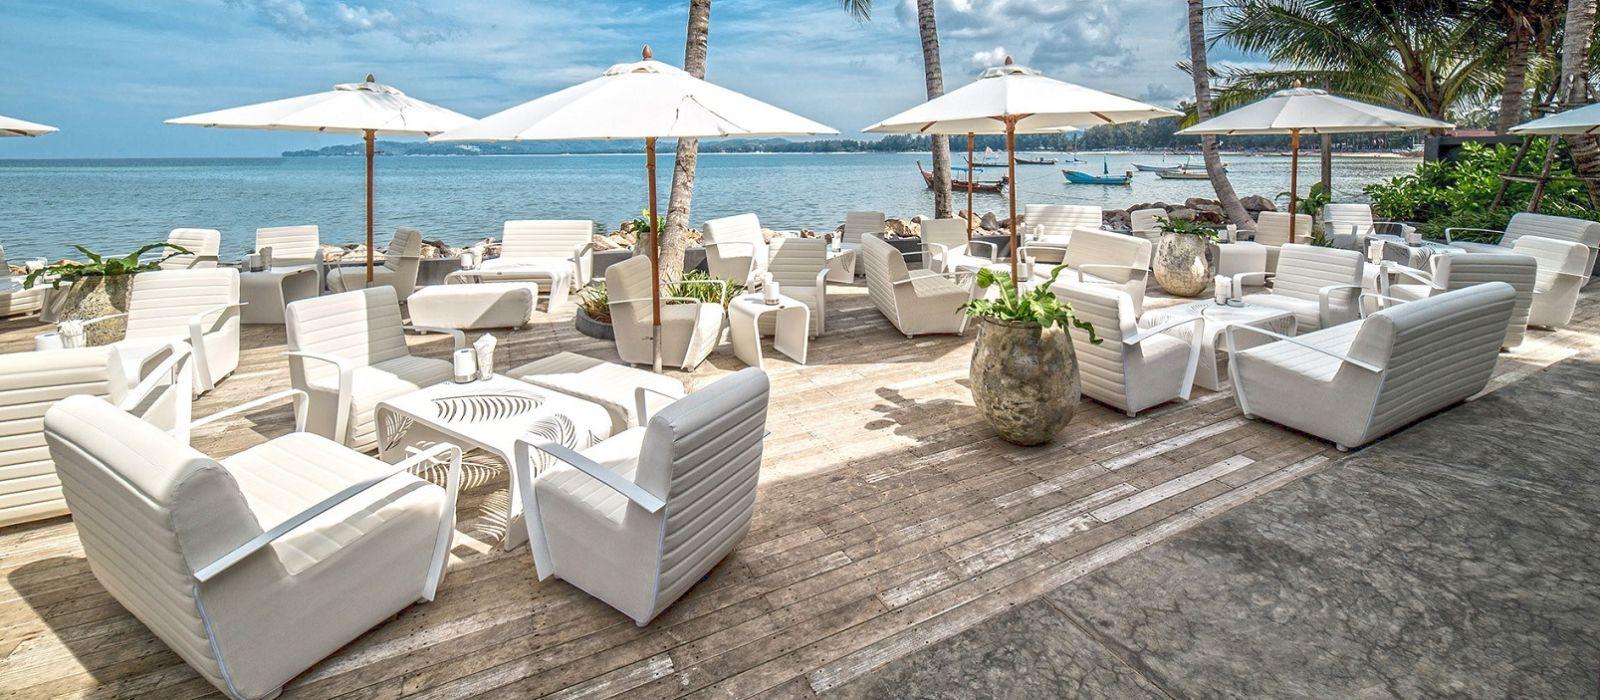 Hotel Twinpalms Phuket Resort Thailand